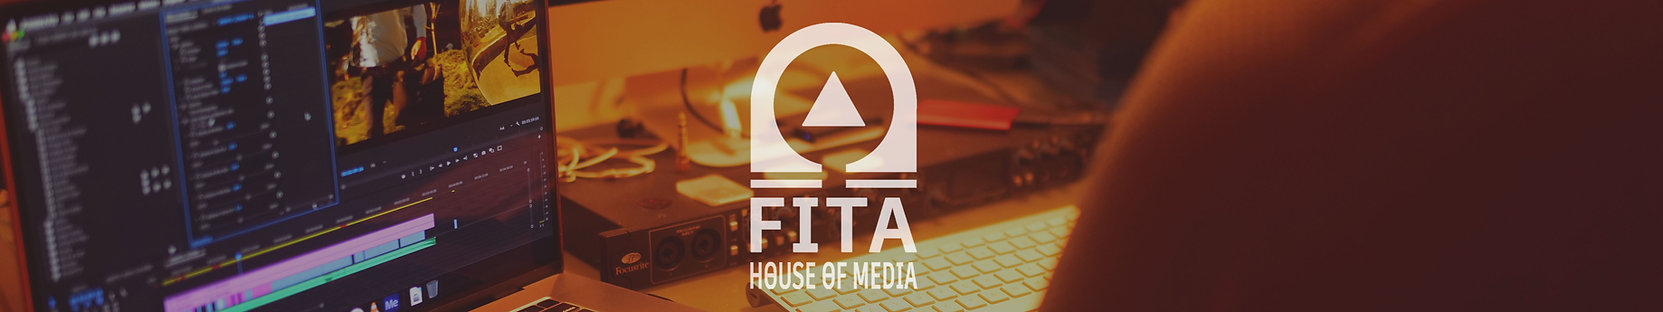 FITA_WEBSITE_VIDEO_BANNER.jpg